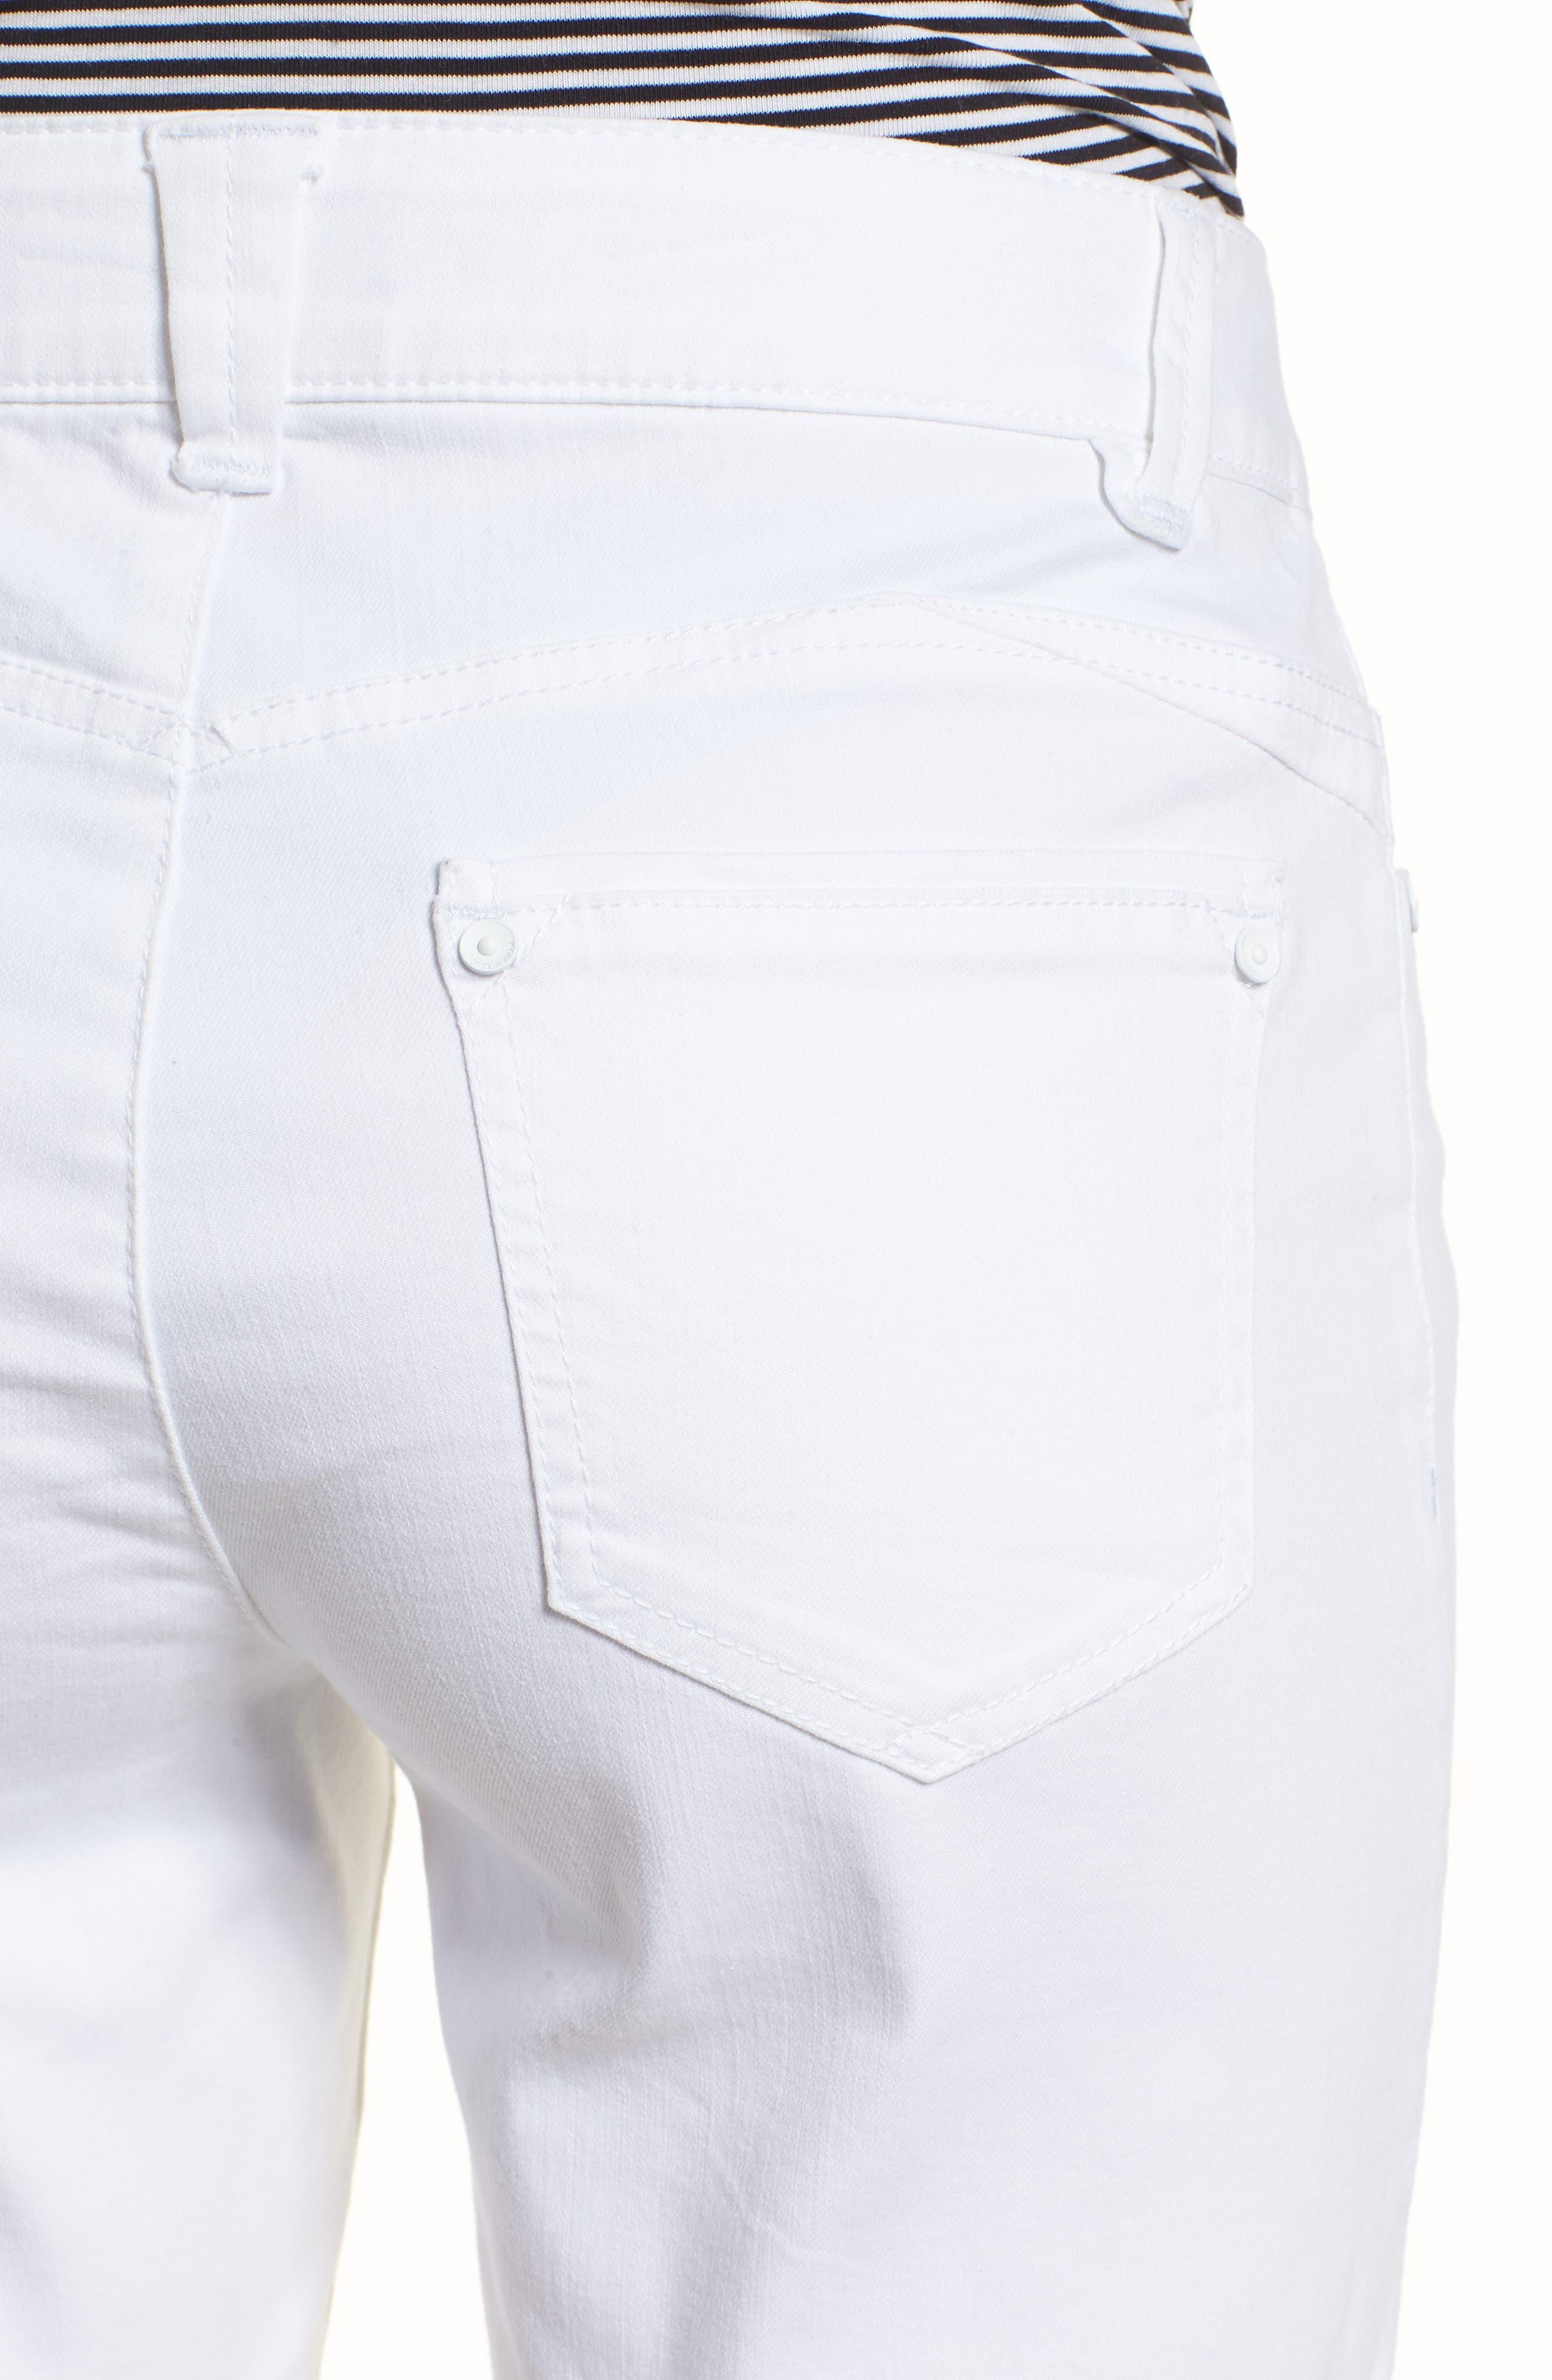 Ab-Solution White Denim Shorts,                             Alternate thumbnail 4, color,                             Optic White